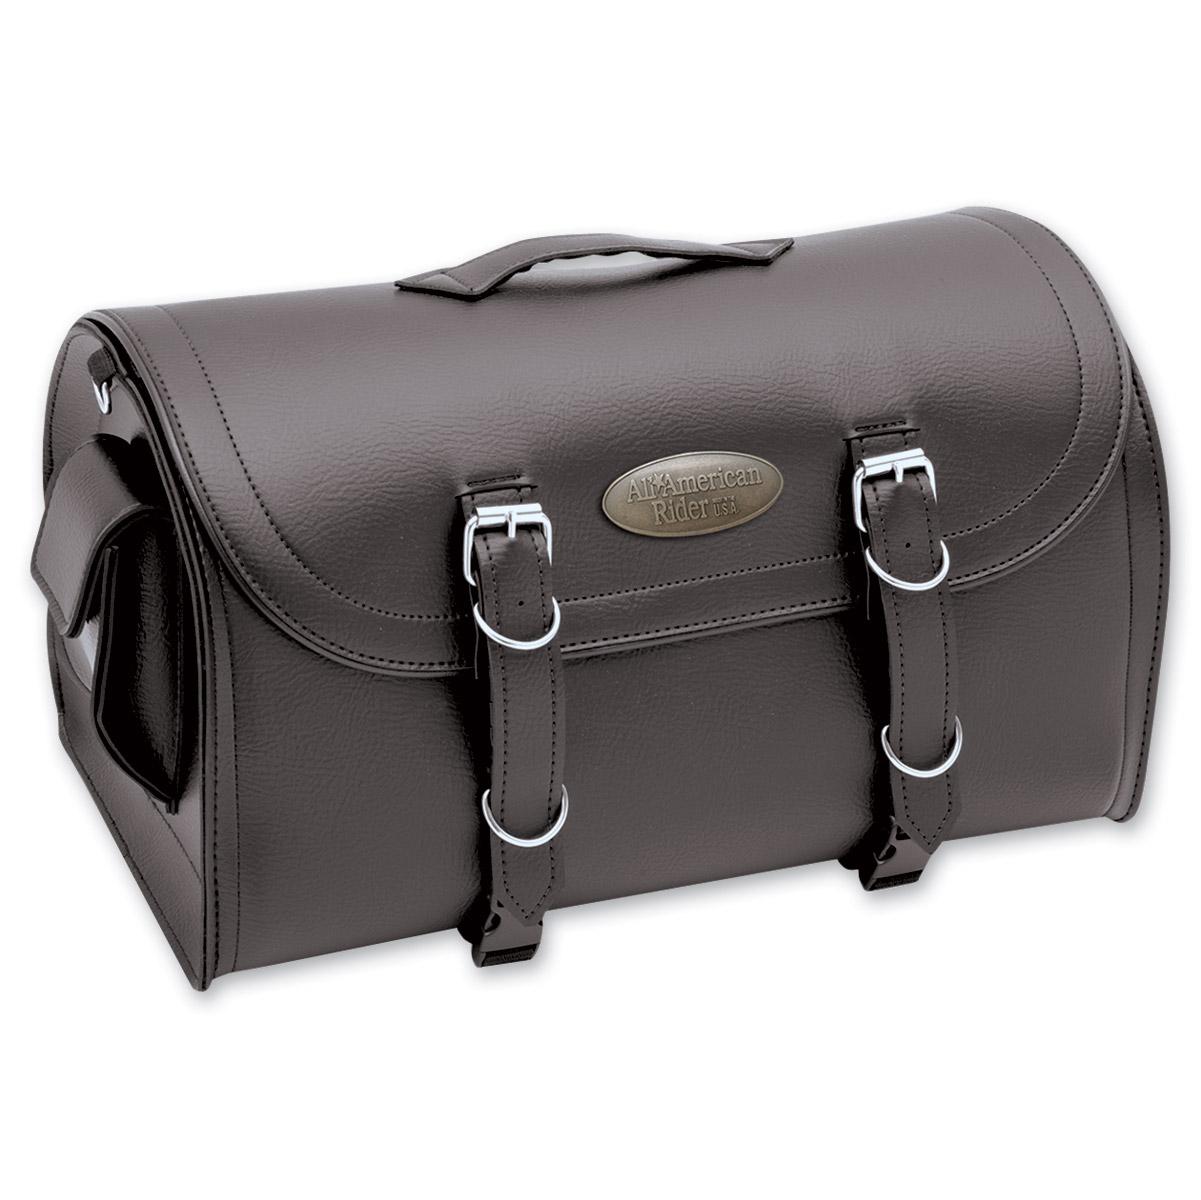 All American Rider Classic Traveler Bag